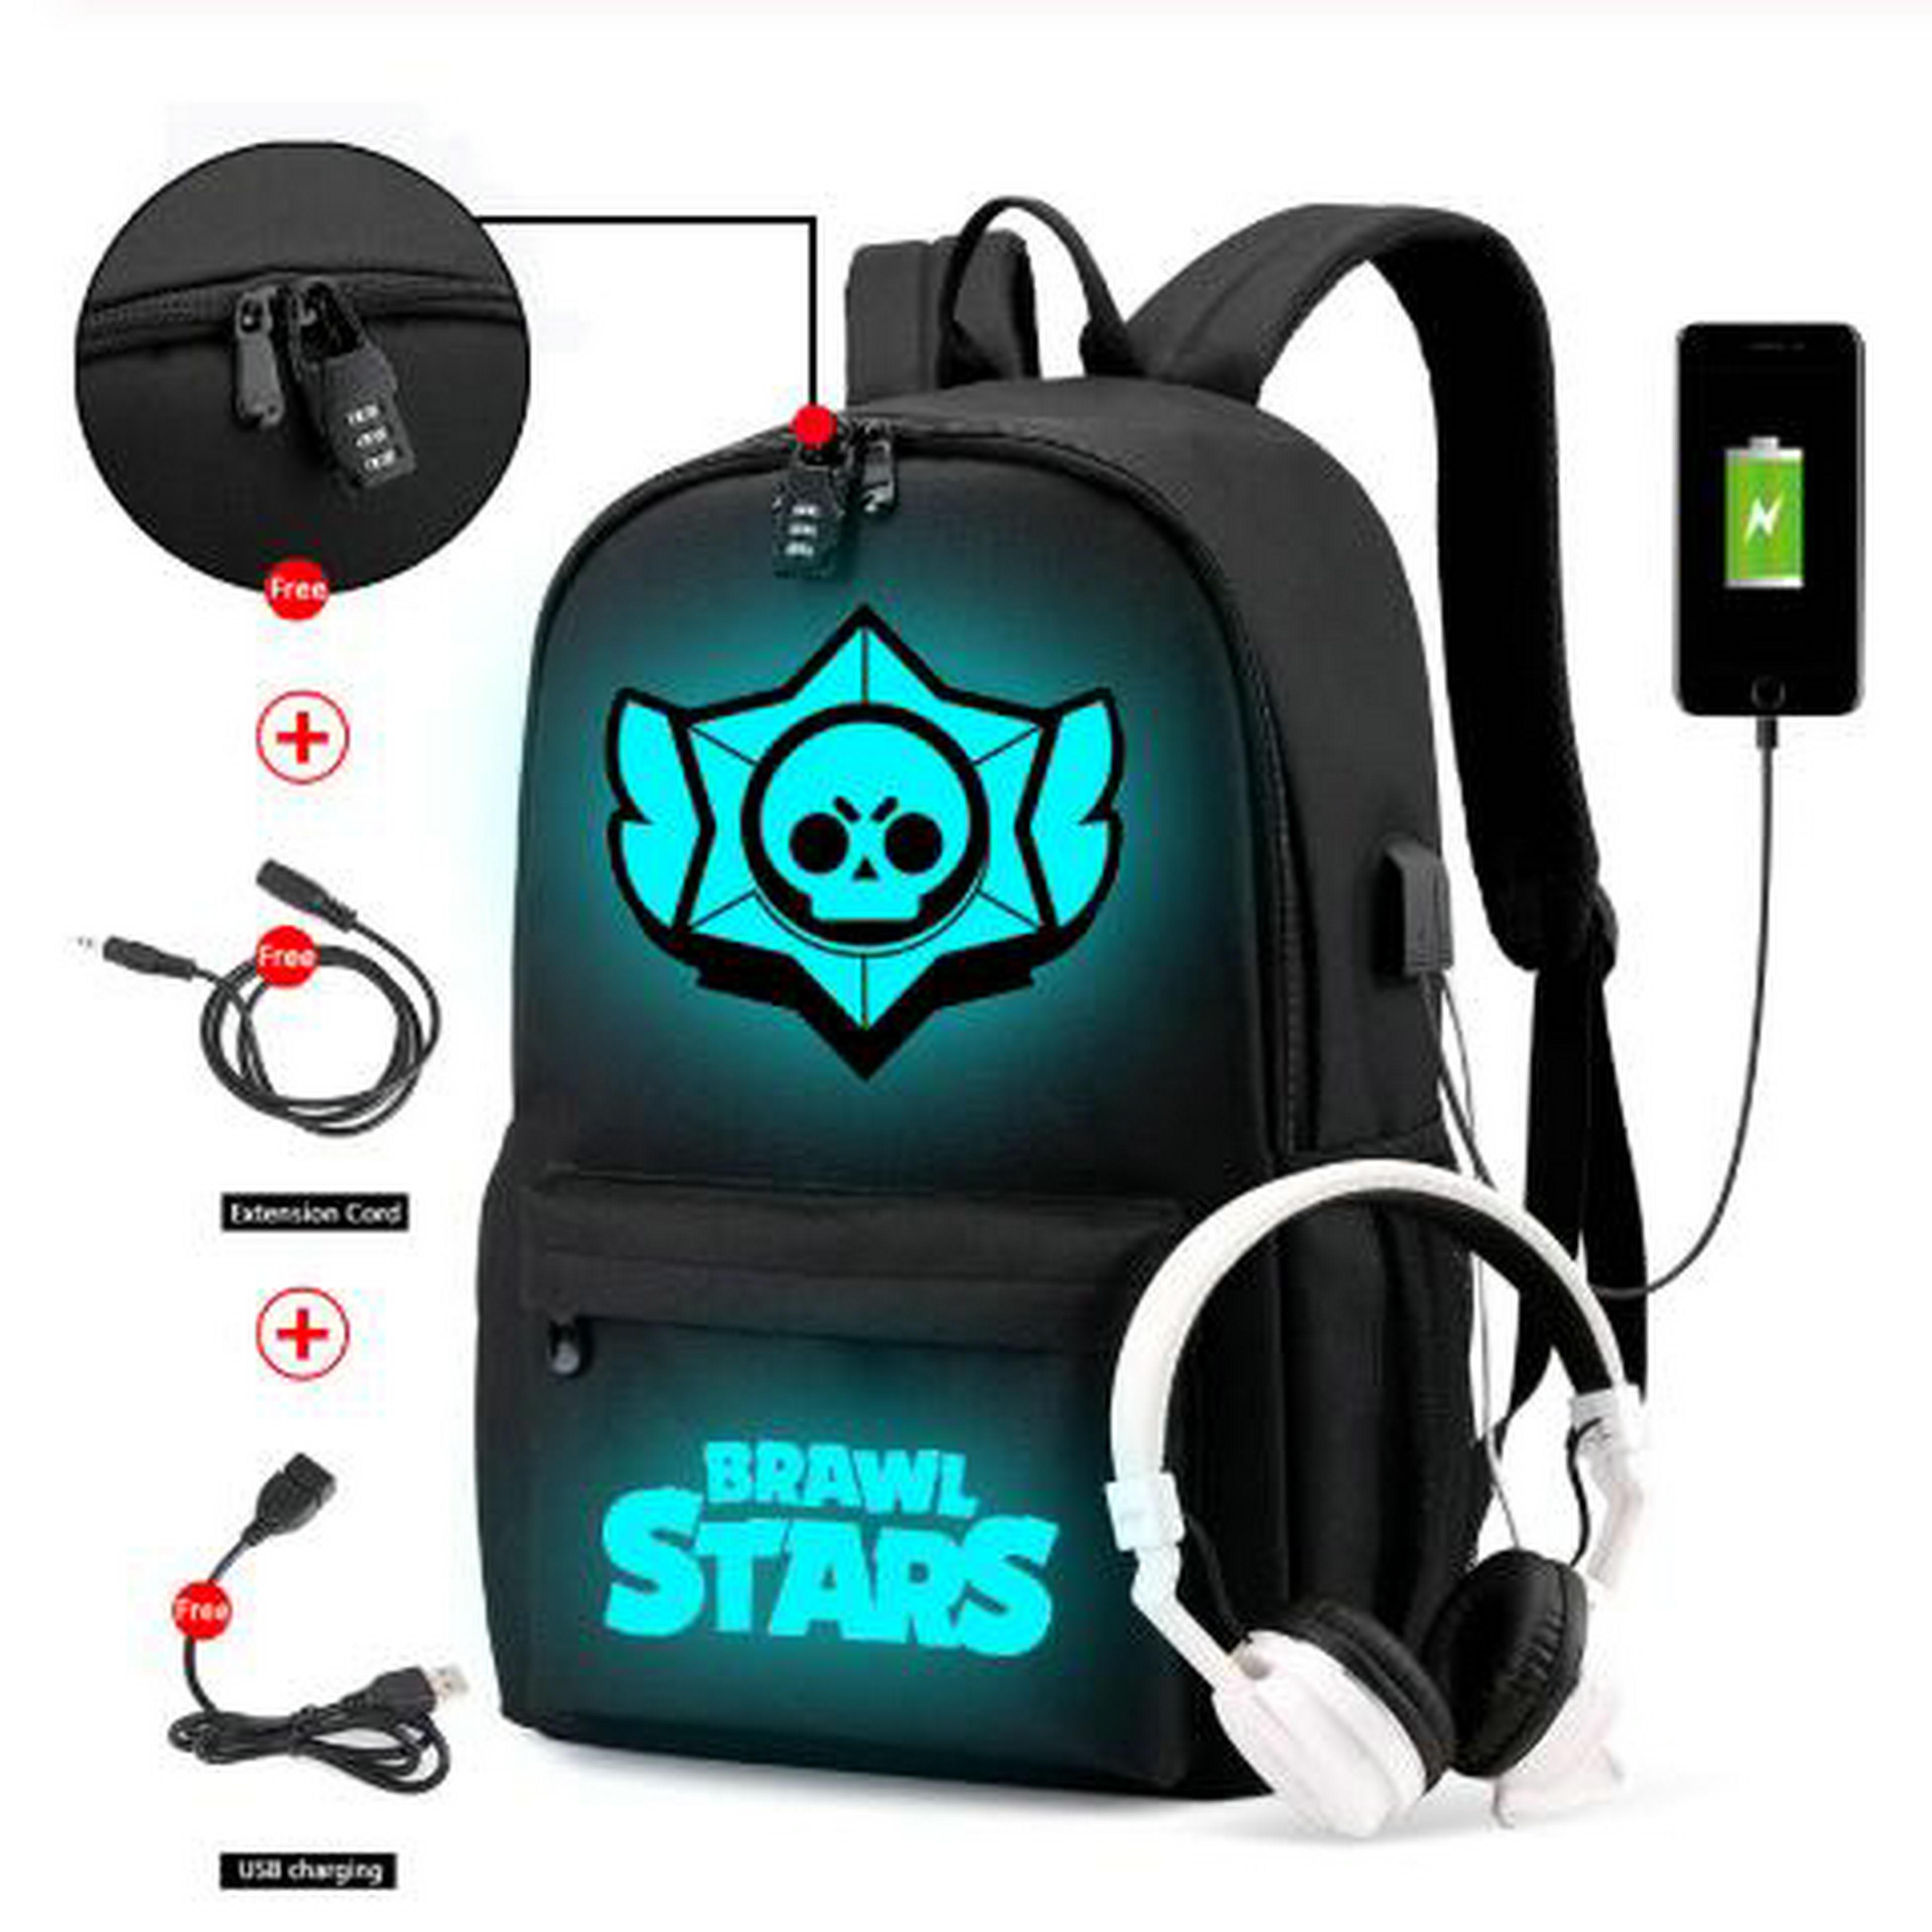 Brawl Stars Backpack Unisex Anti-theft Laptop Luminous Backpacks Fashion Nylon Waterproof Travel USB Charging Backpack